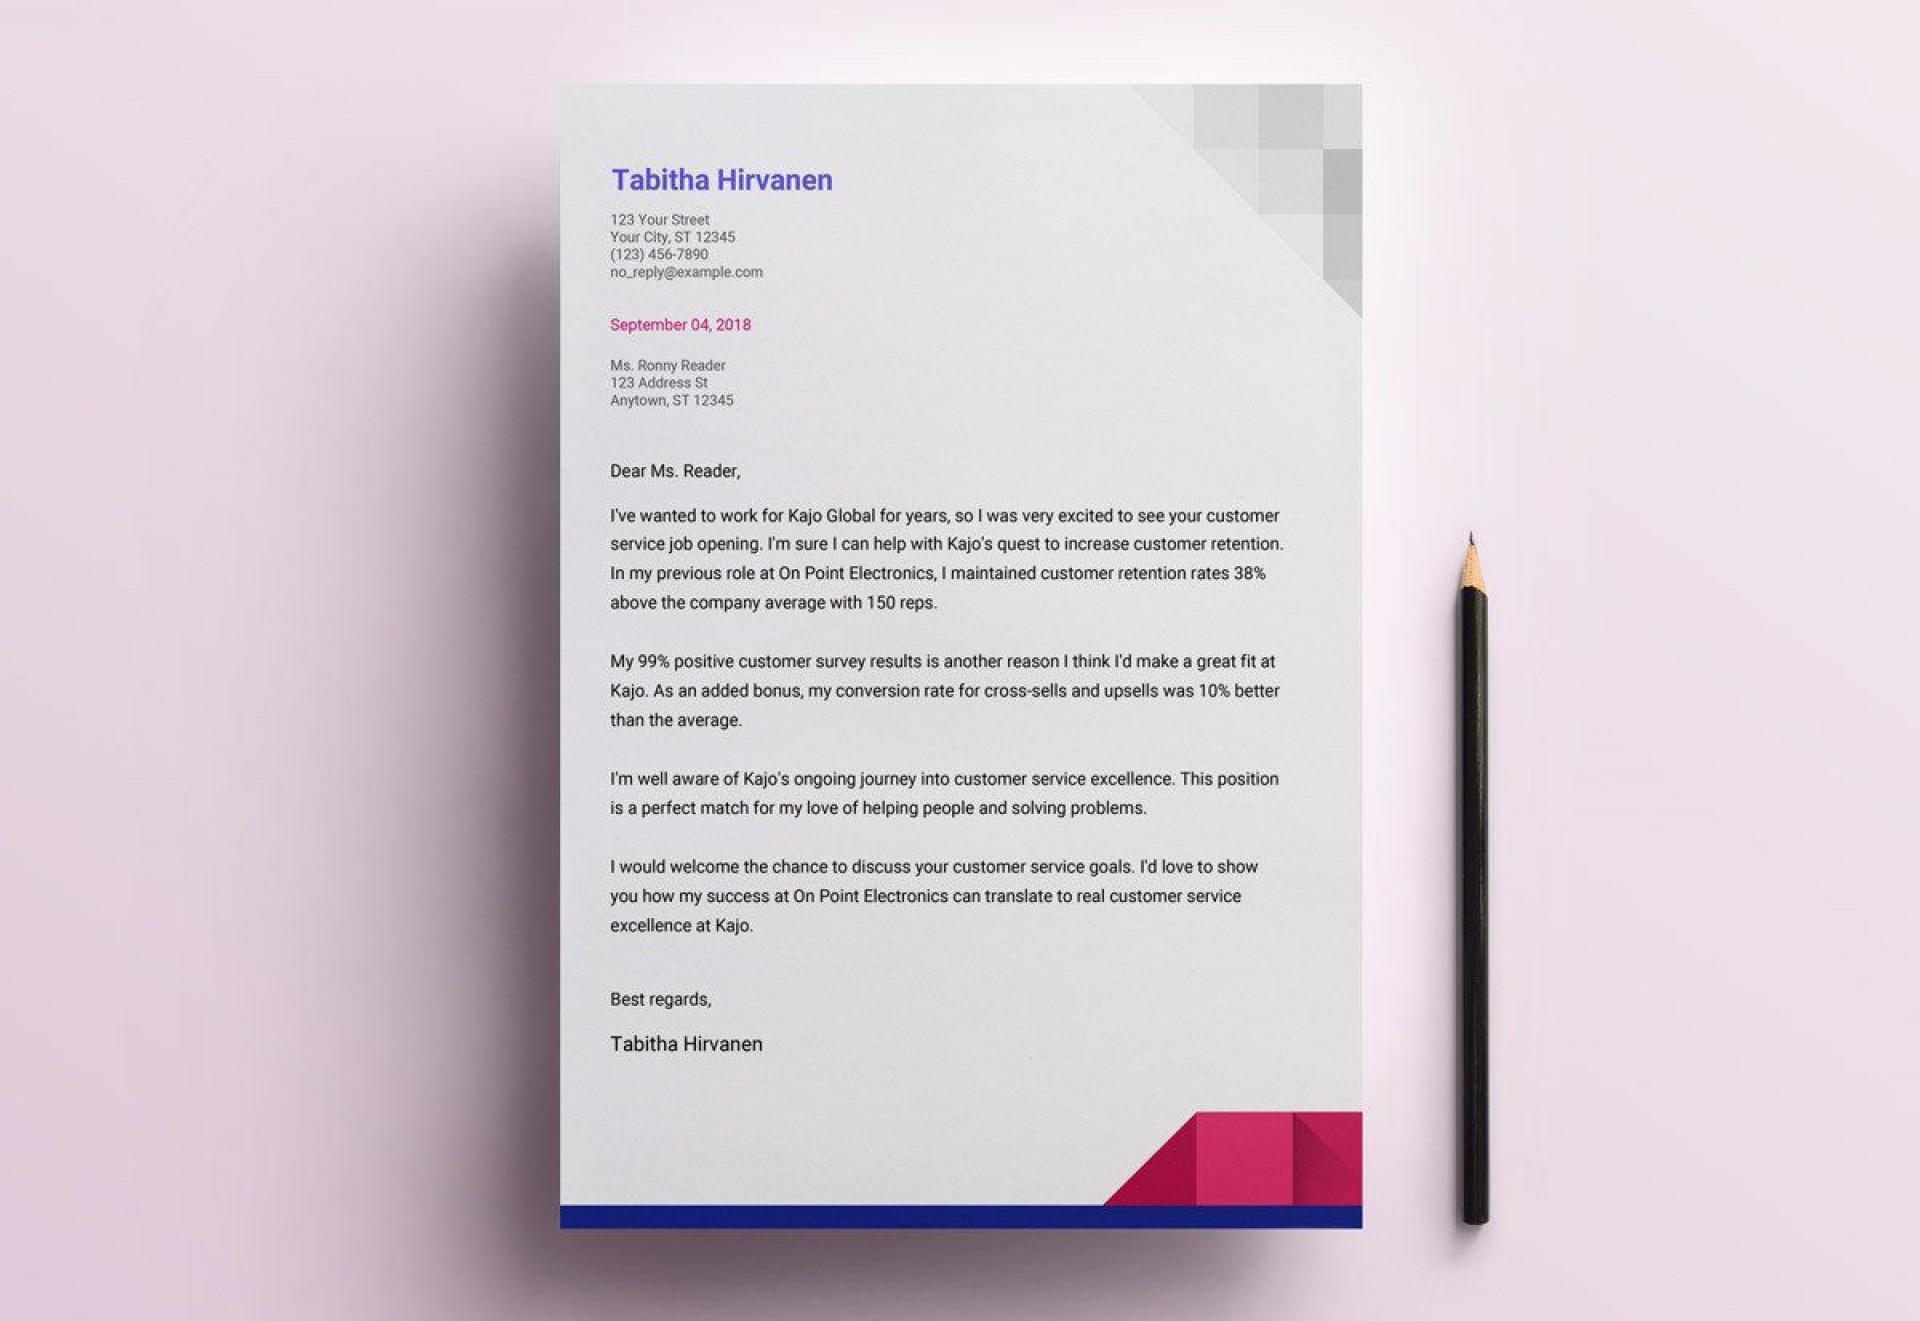 002 Unbelievable Google Doc Cover Letter Template Highest Quality  Swis Free Reddit1920